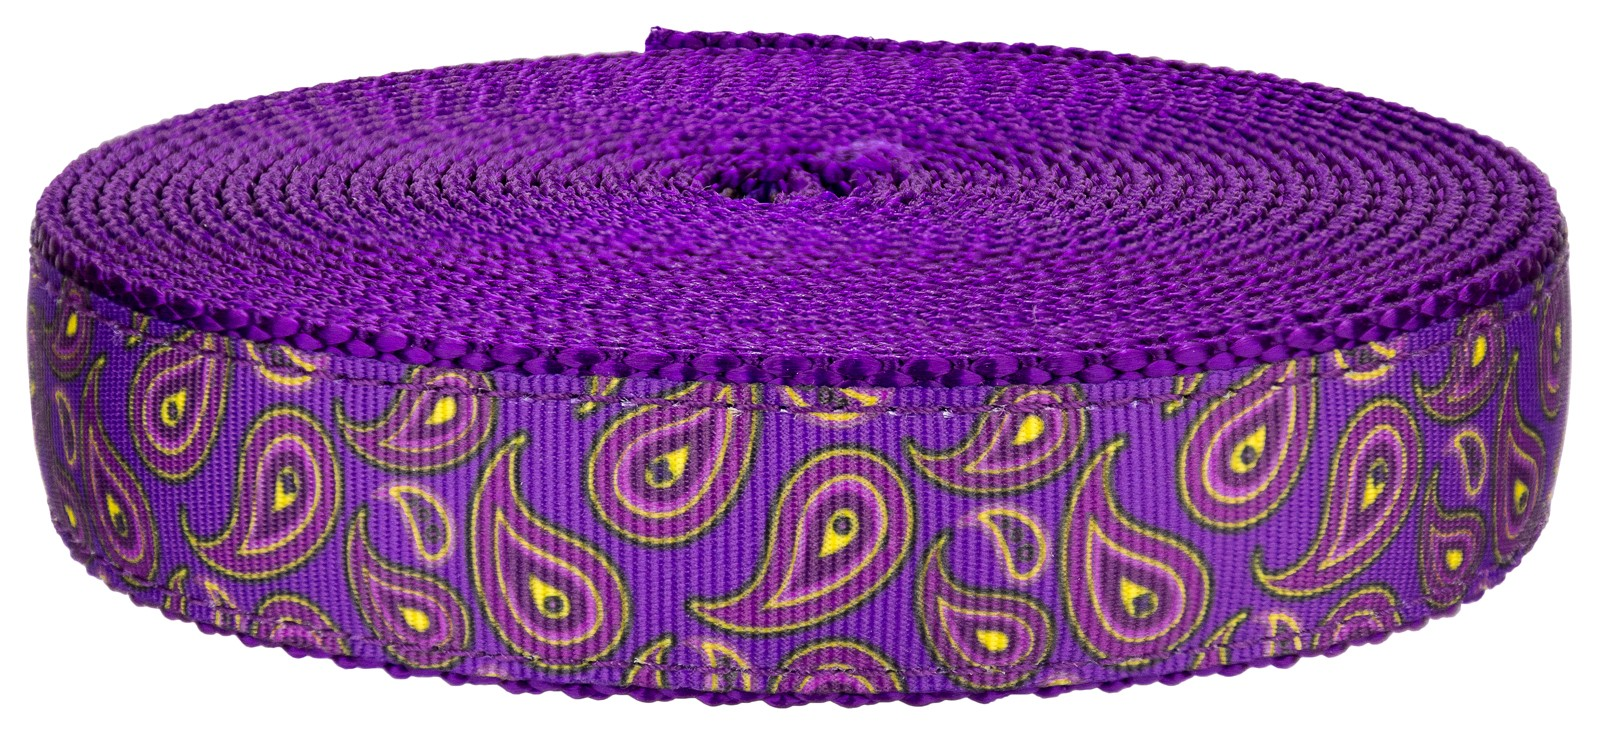 buy 1 inch purple paisley on purple nylon webbing online